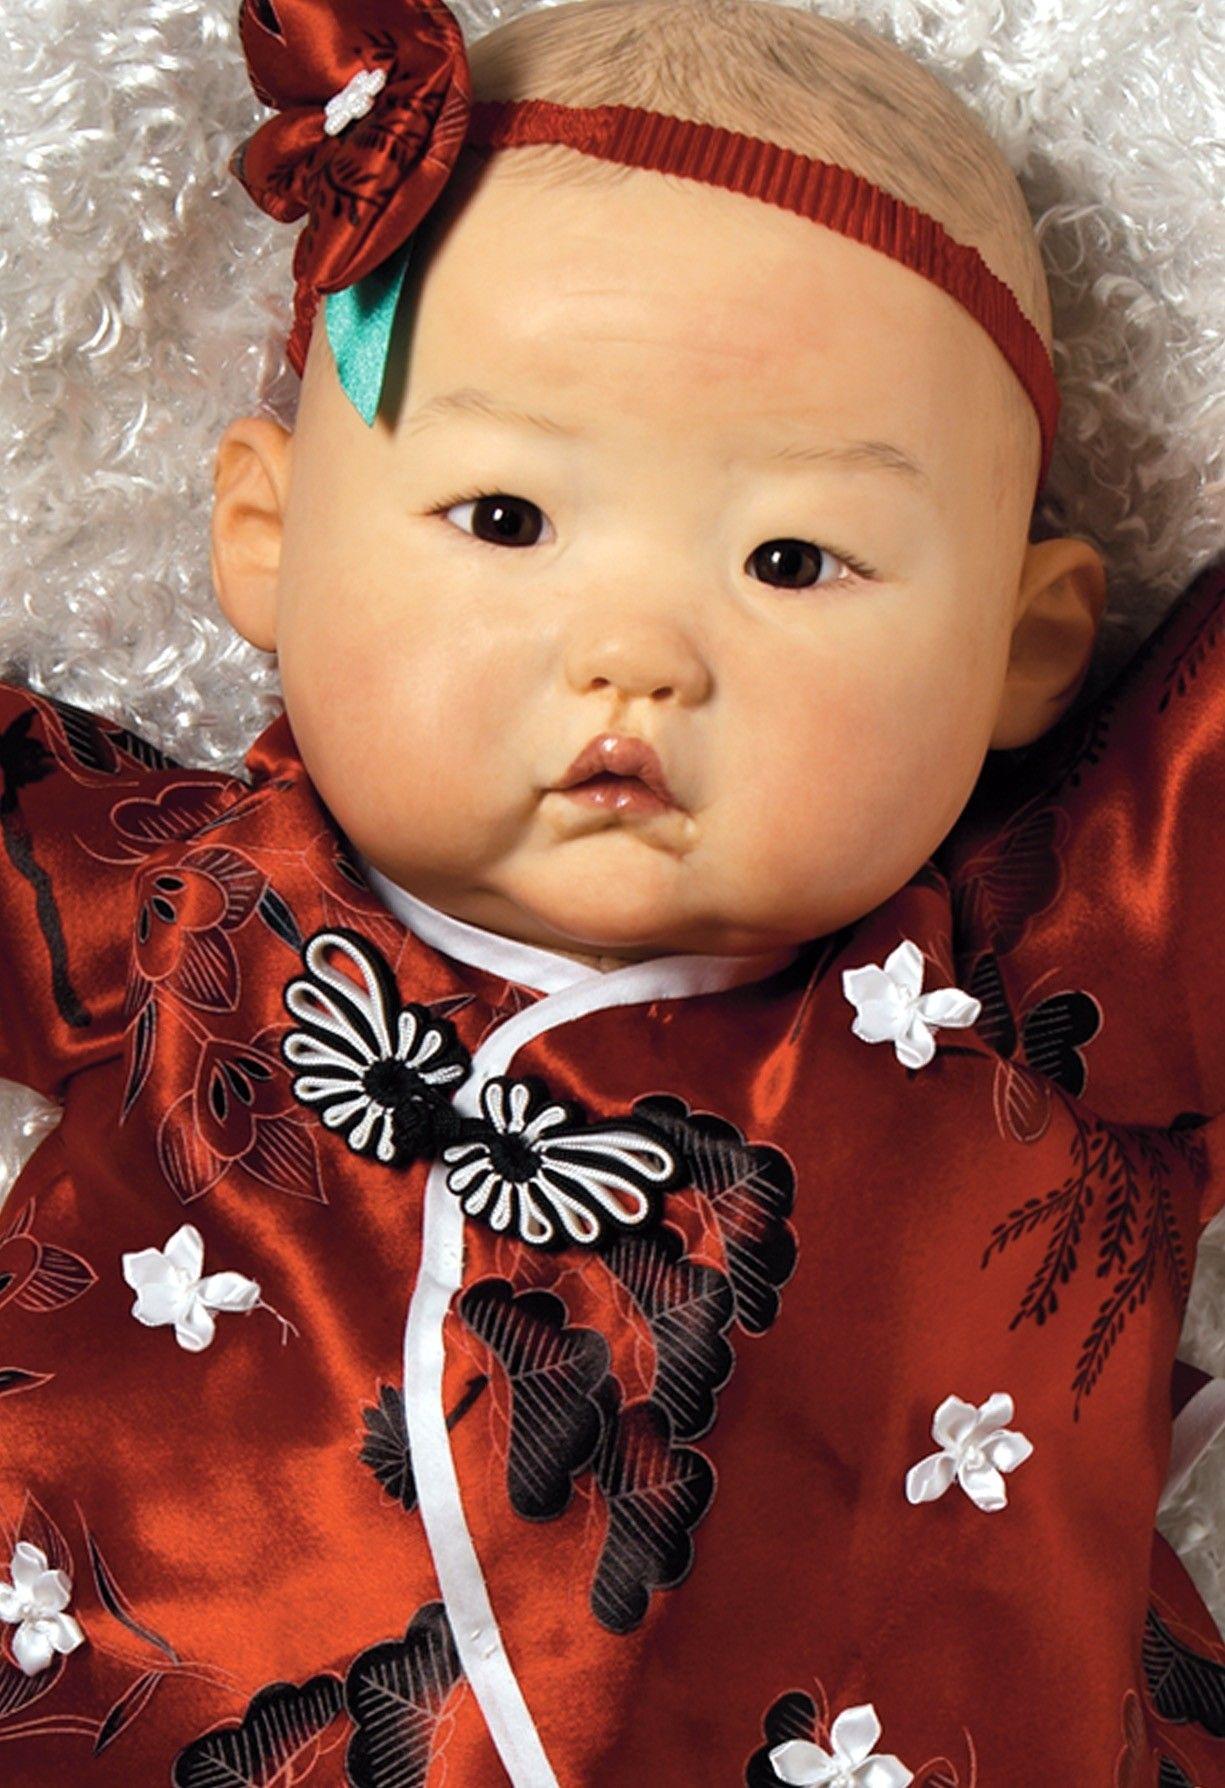 baby girl La doll asian